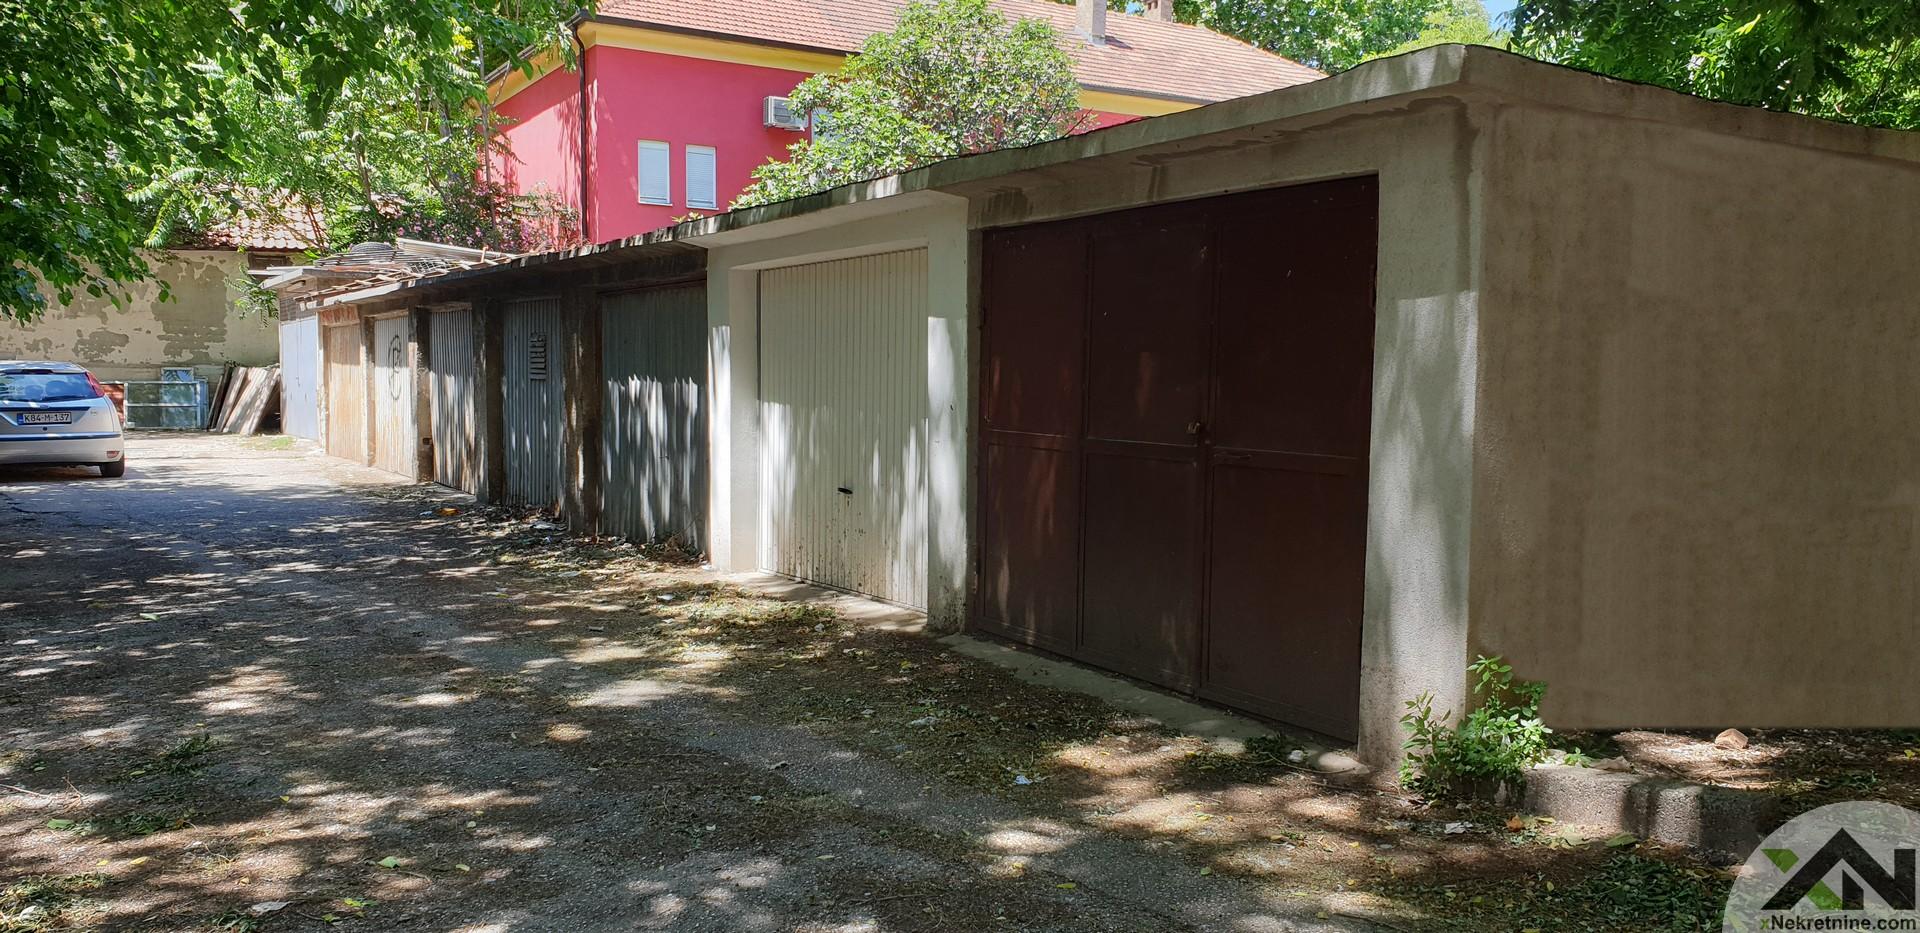 Garaža - Zagrebačka ulica